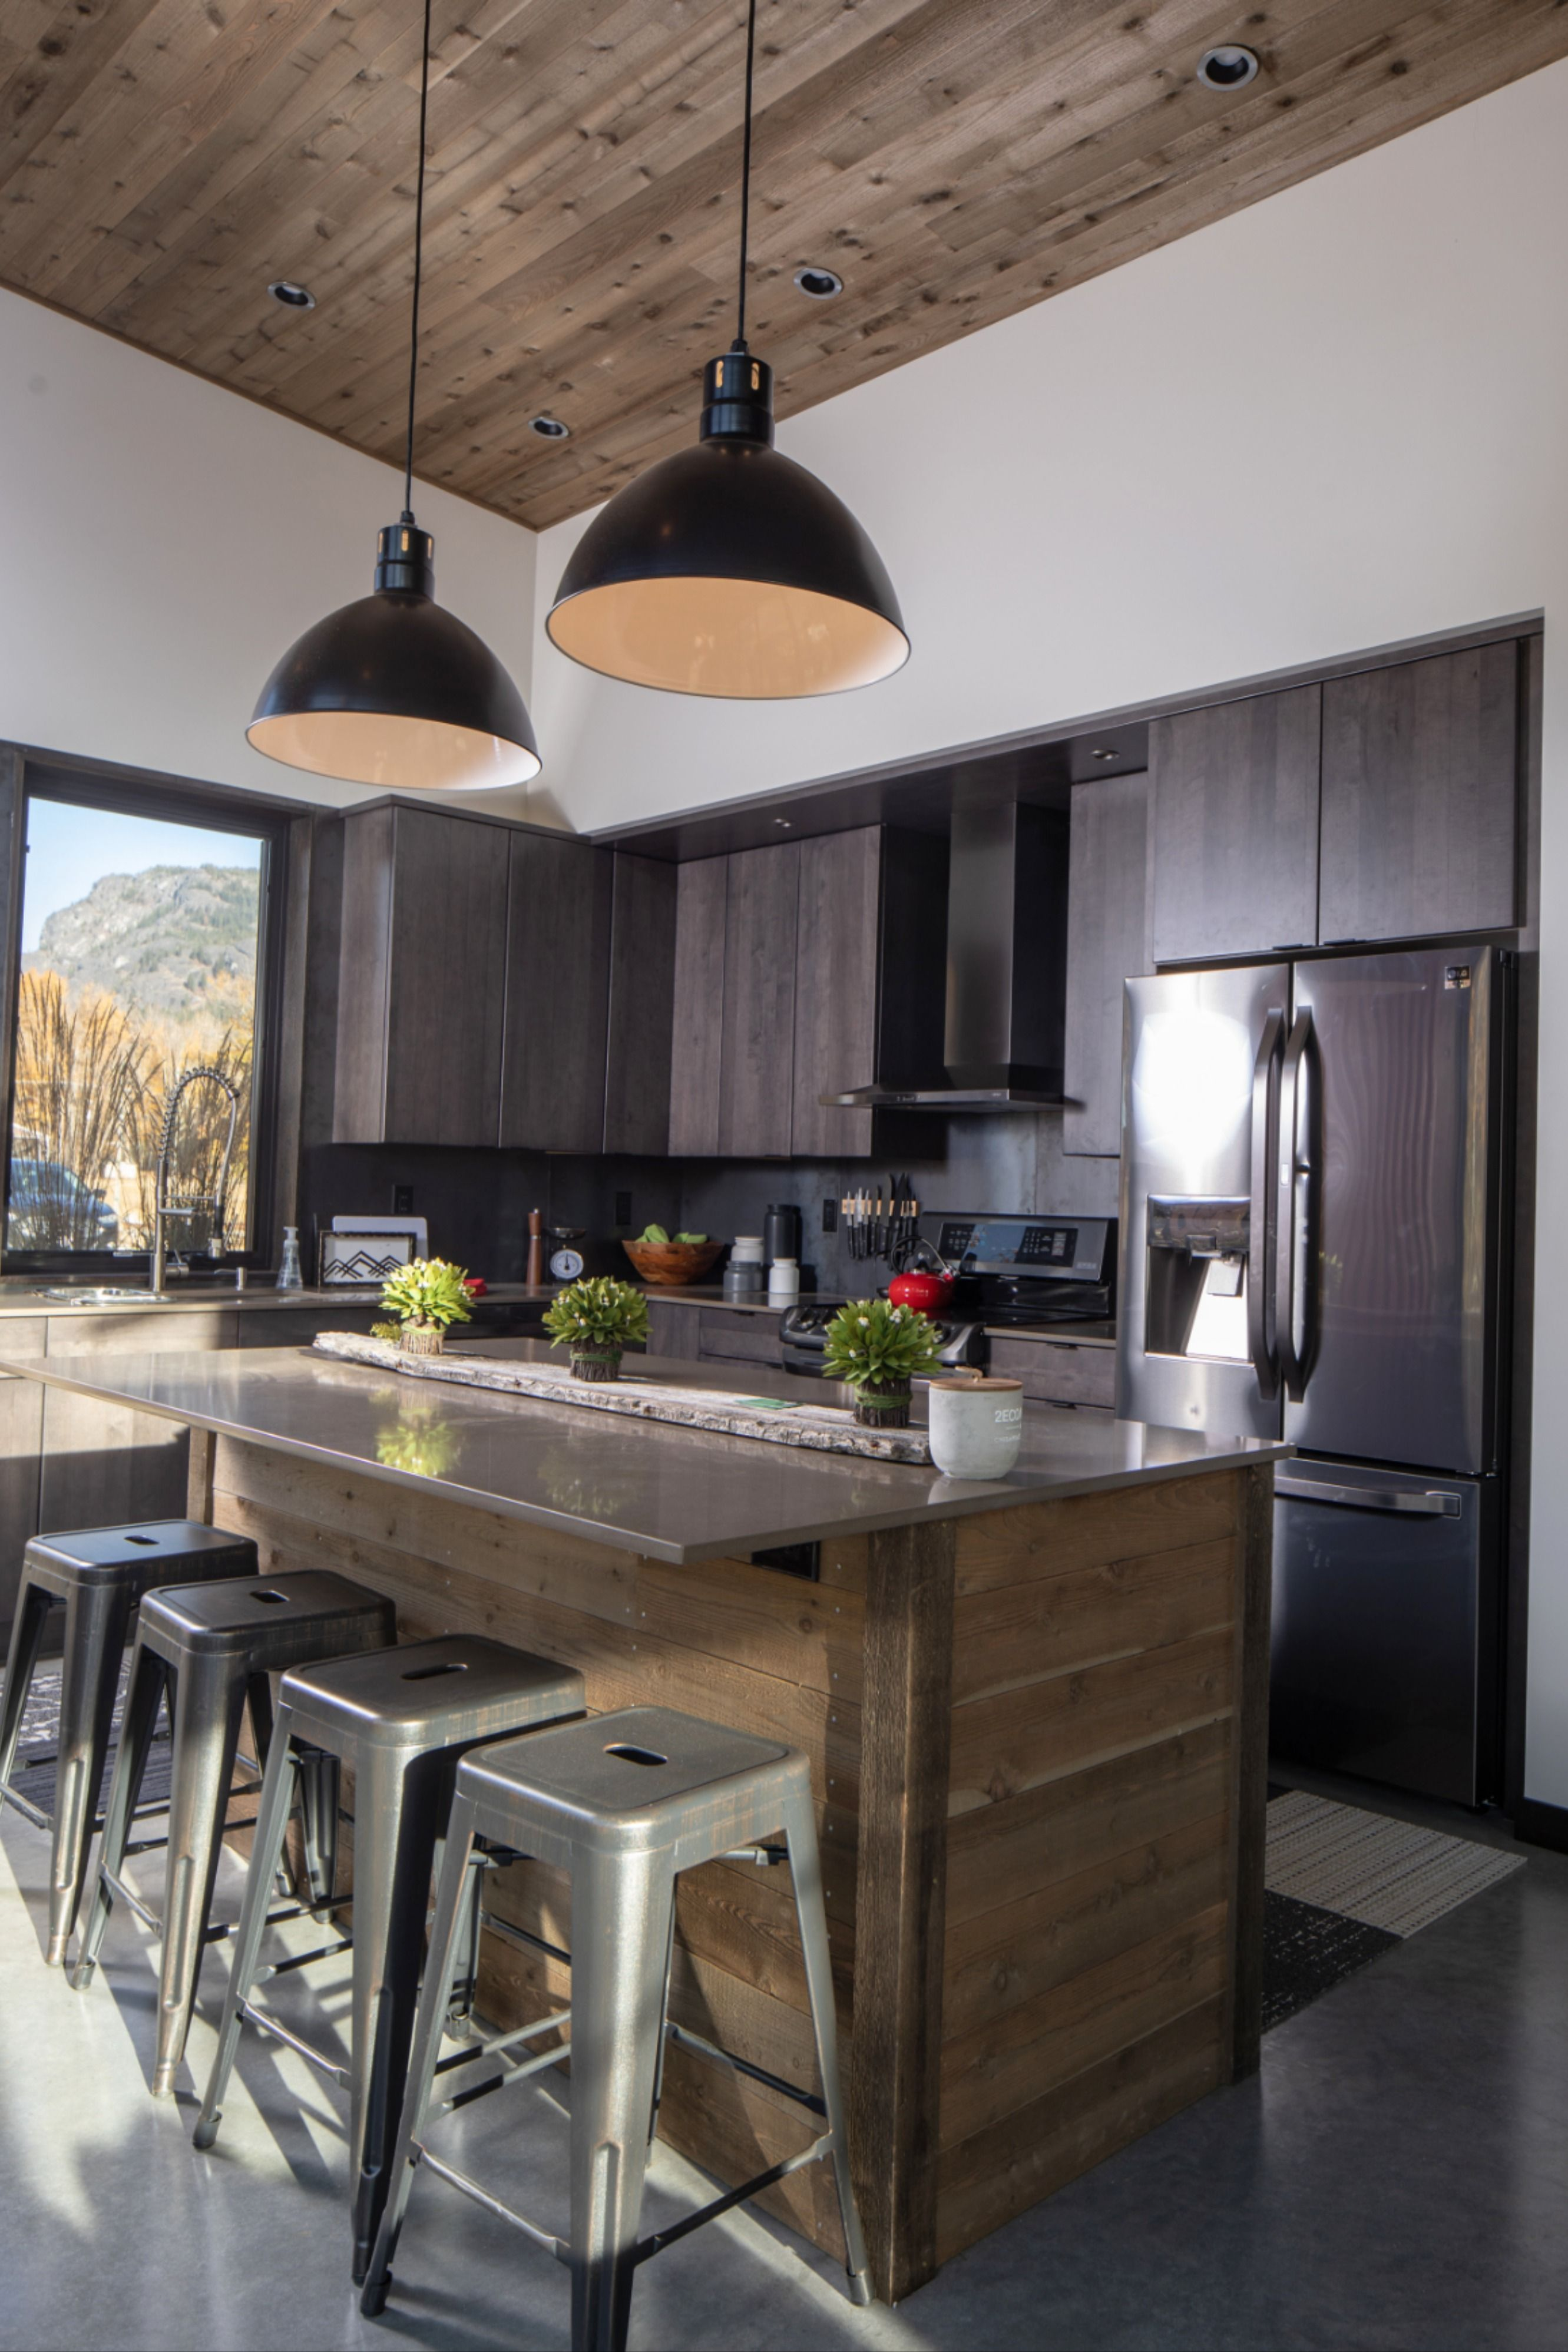 Wilcox Vented Pendant Light in 9   Modern cabin kitchen, Modern ...